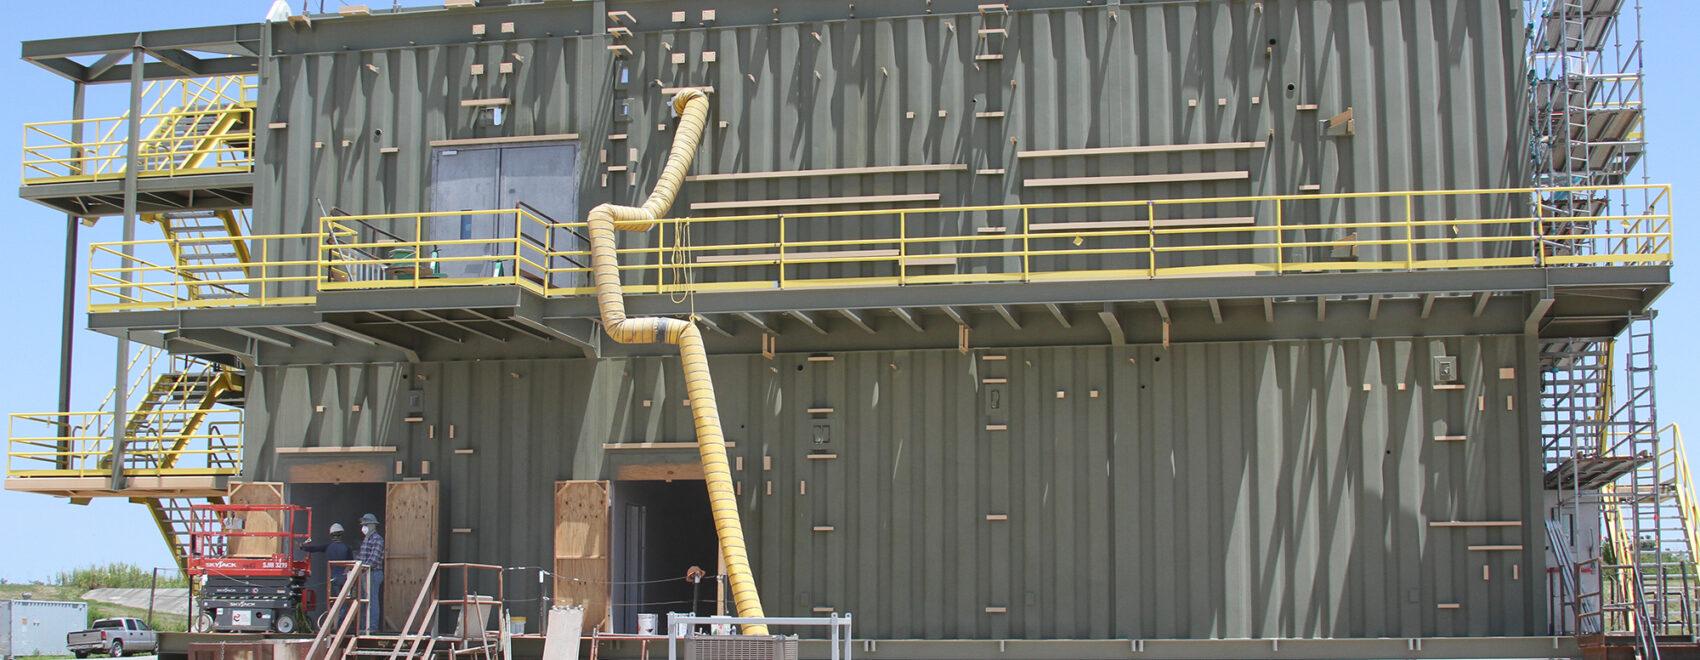 Power Control Distribution Building